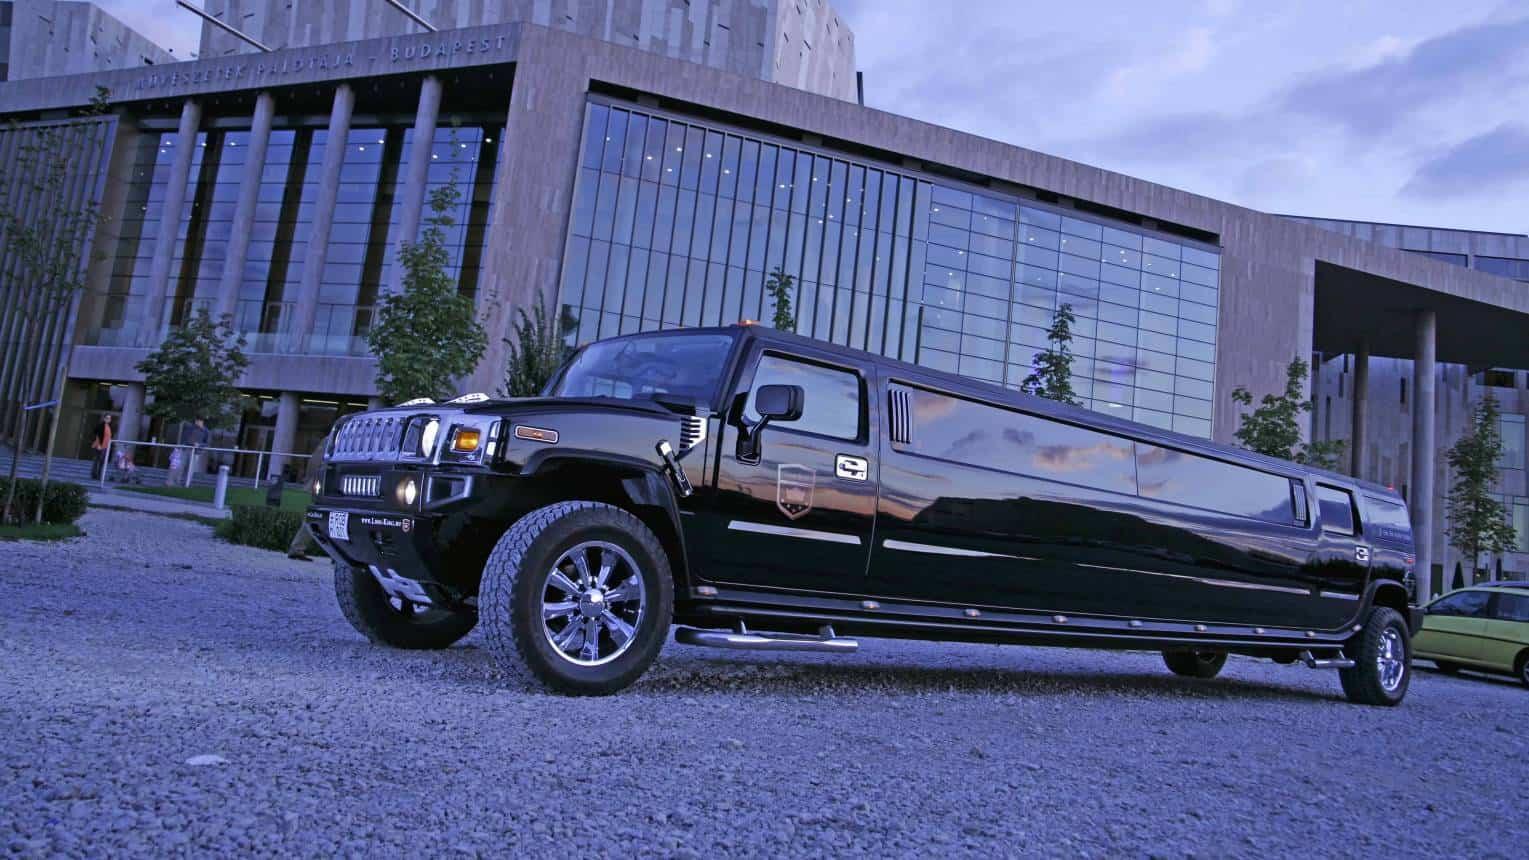 Fekete H2-es Hummer limuzin